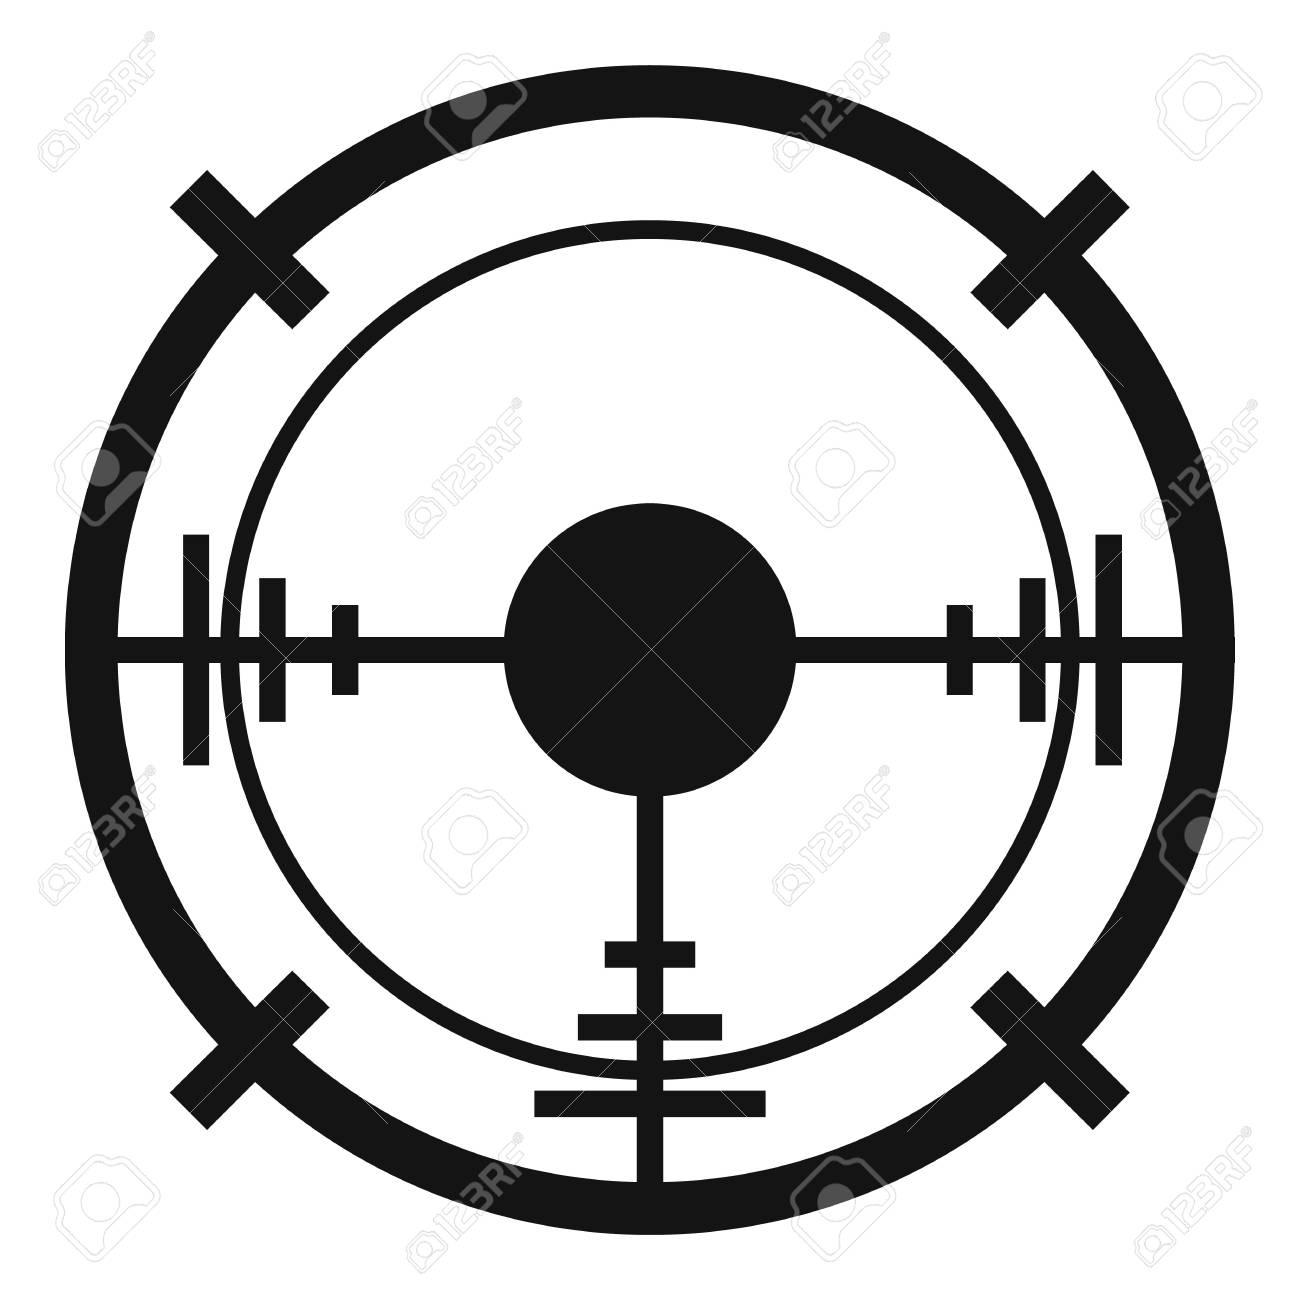 Sniper elite aim icon. Simple illustration of sniper elite aim vector icon  for web design